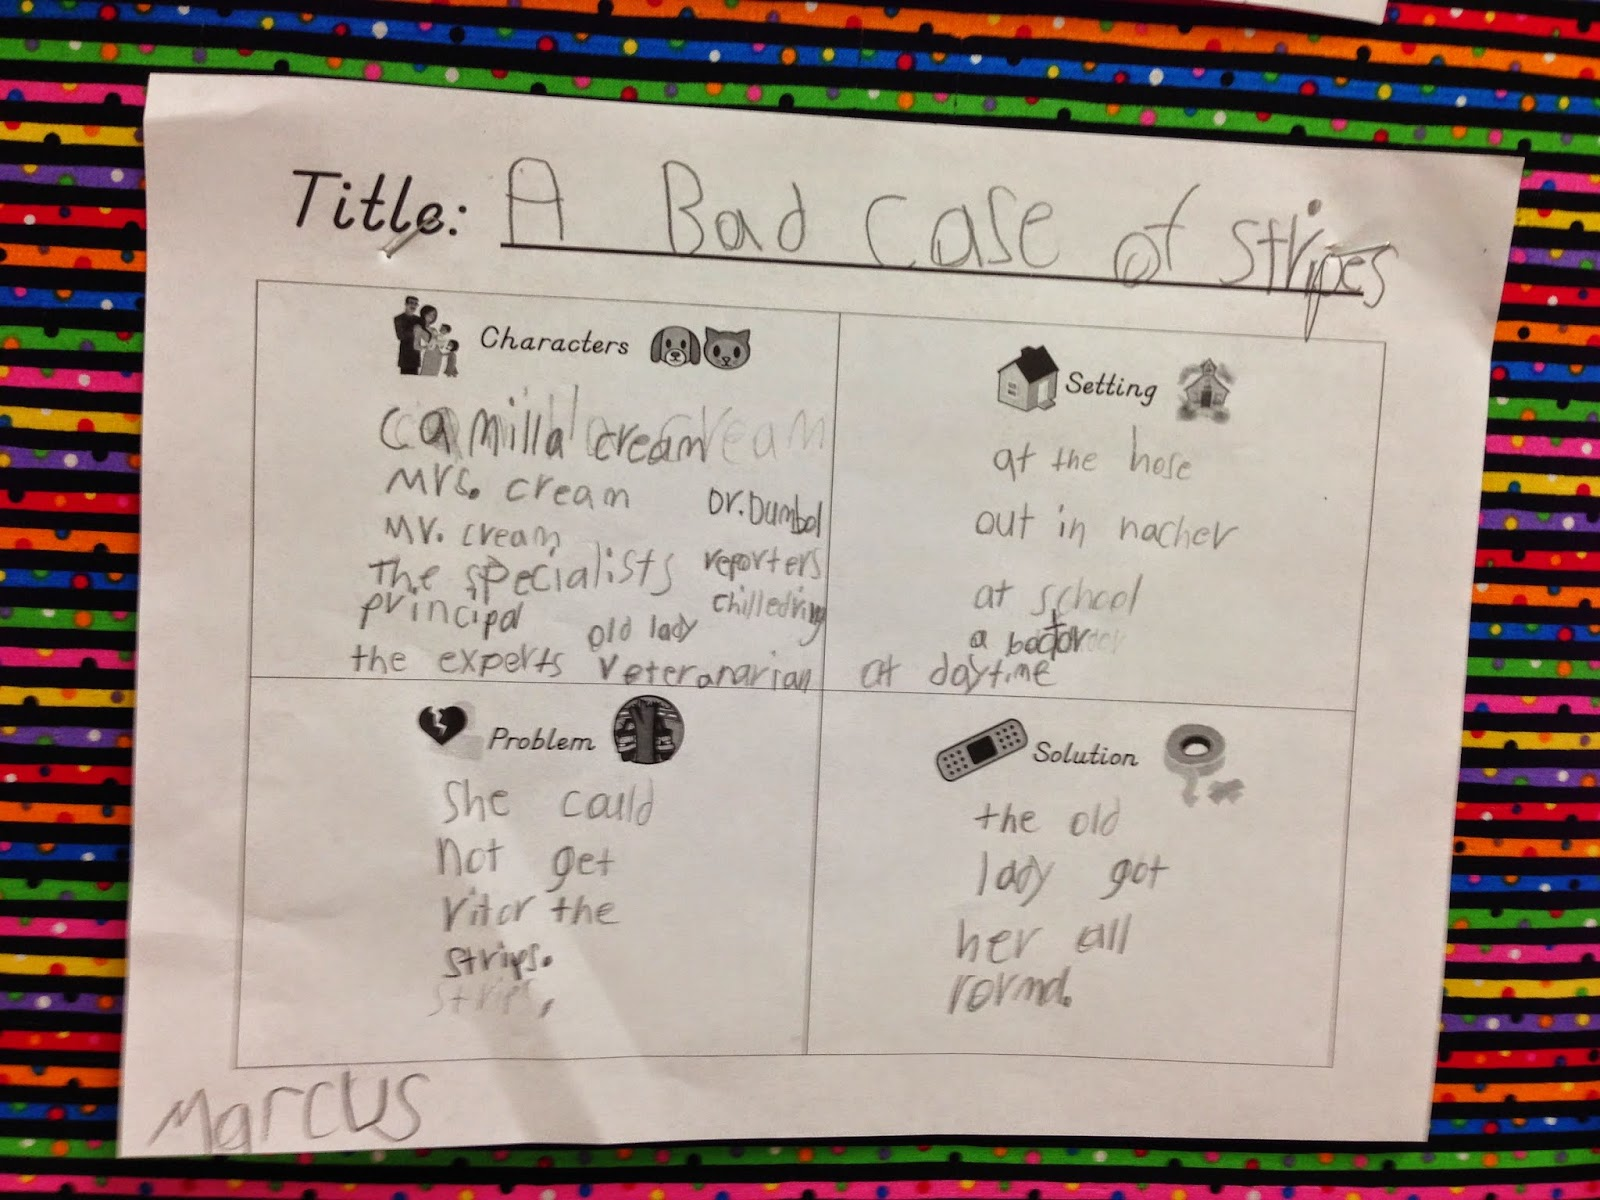 Bishop S Blackboard An Elementary Education Blog A Bad